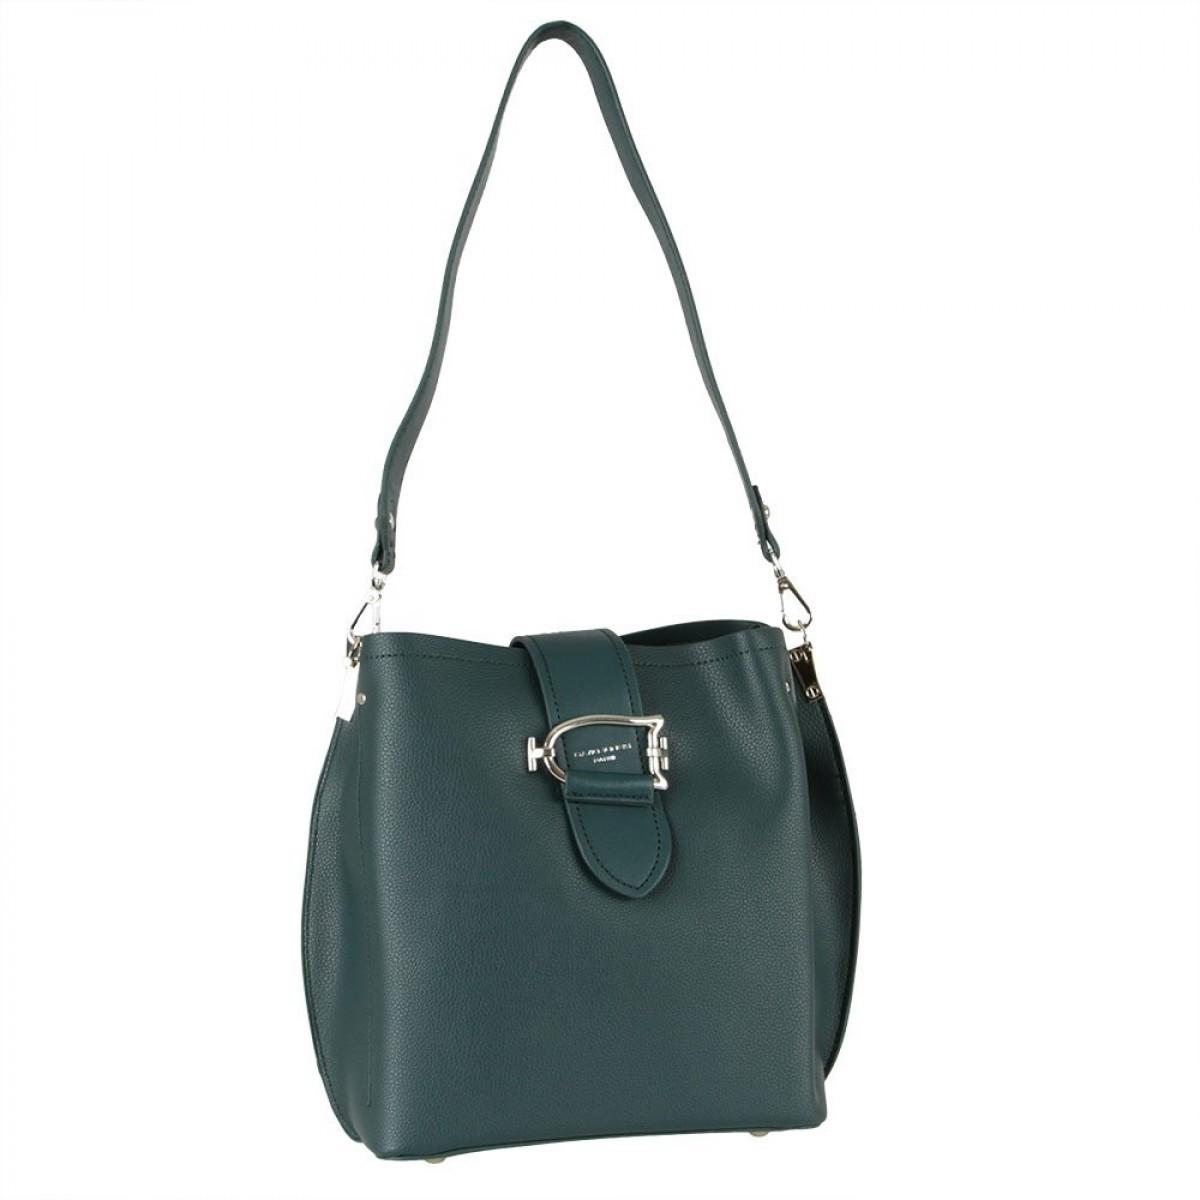 Жіноча сумка David Jones 6403-2 PEACOCK BLUE